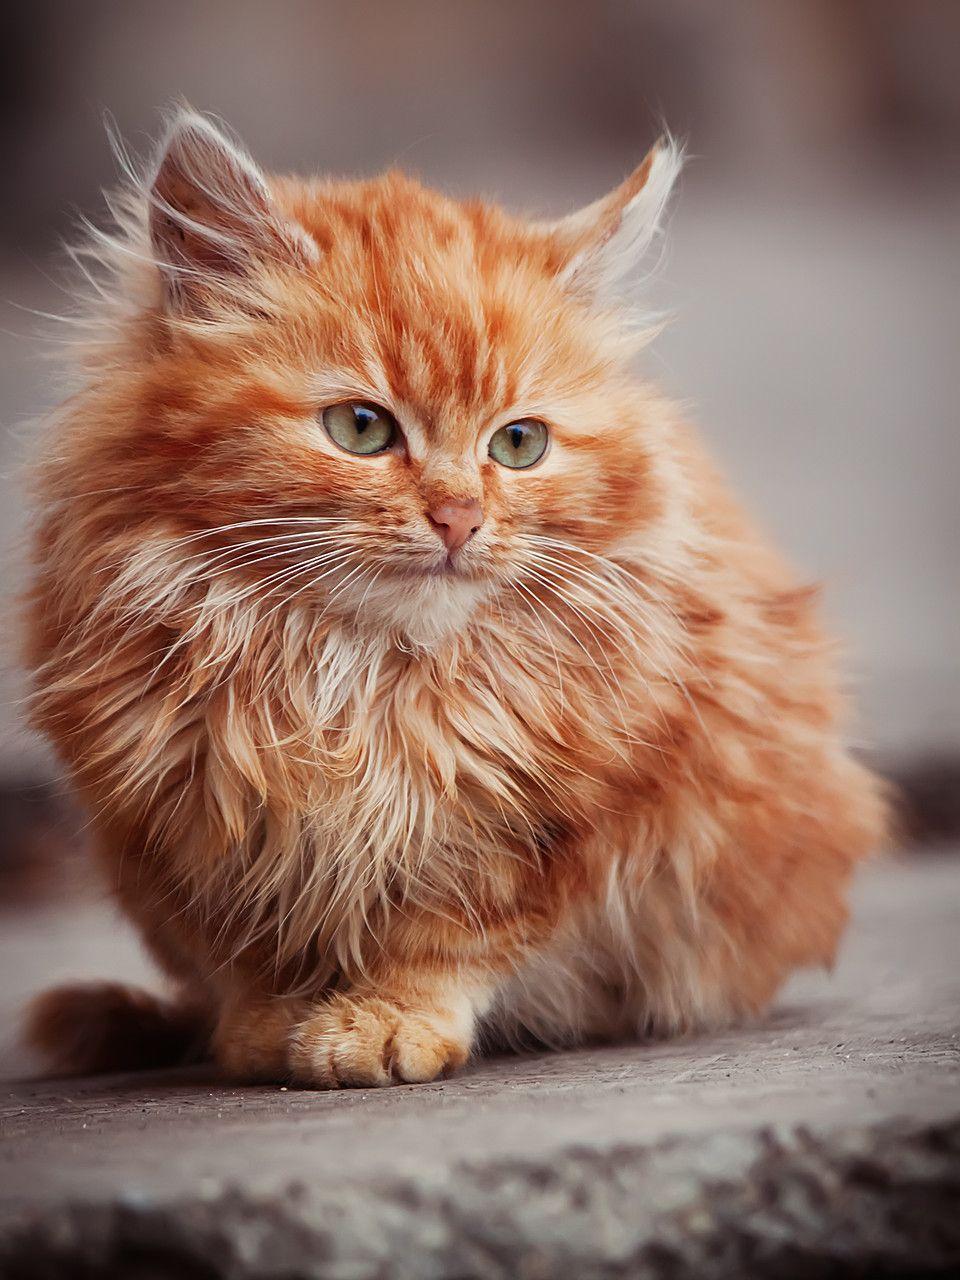 He Is So Grumpy But He Is So Small I Wanna Pinch His Cheeks But Gently He S Great Gattini Piccoli Adorabili Gattini Gatti E Gattini